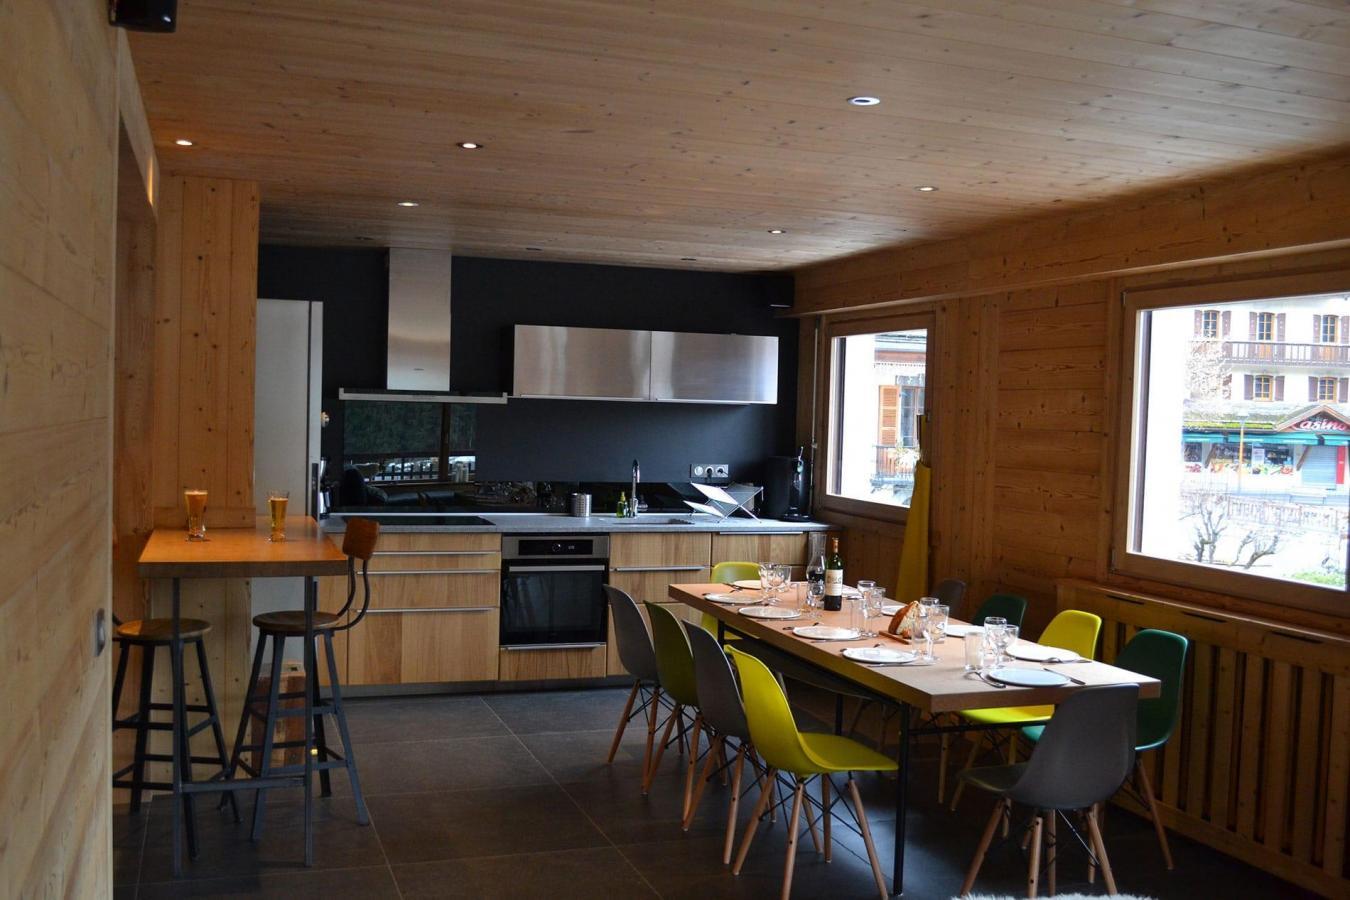 Location au ski Appartement 5 pièces 10 personnes (001) - Residence Le Danay - Le Grand Bornand - Coin repas